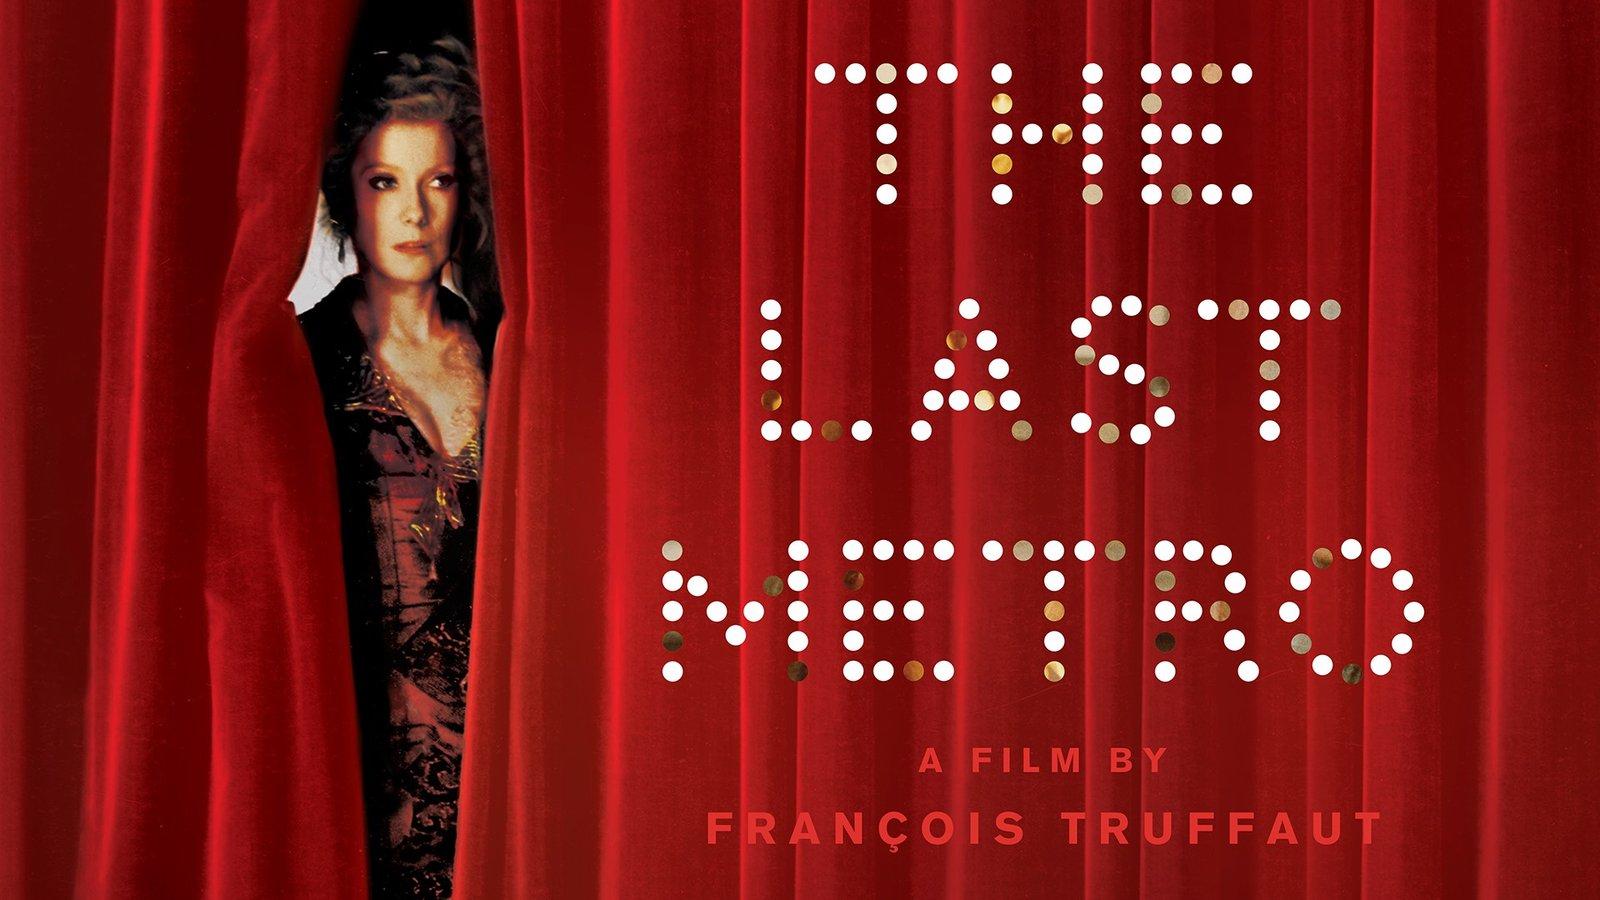 The Last Metro - Le dernier métro